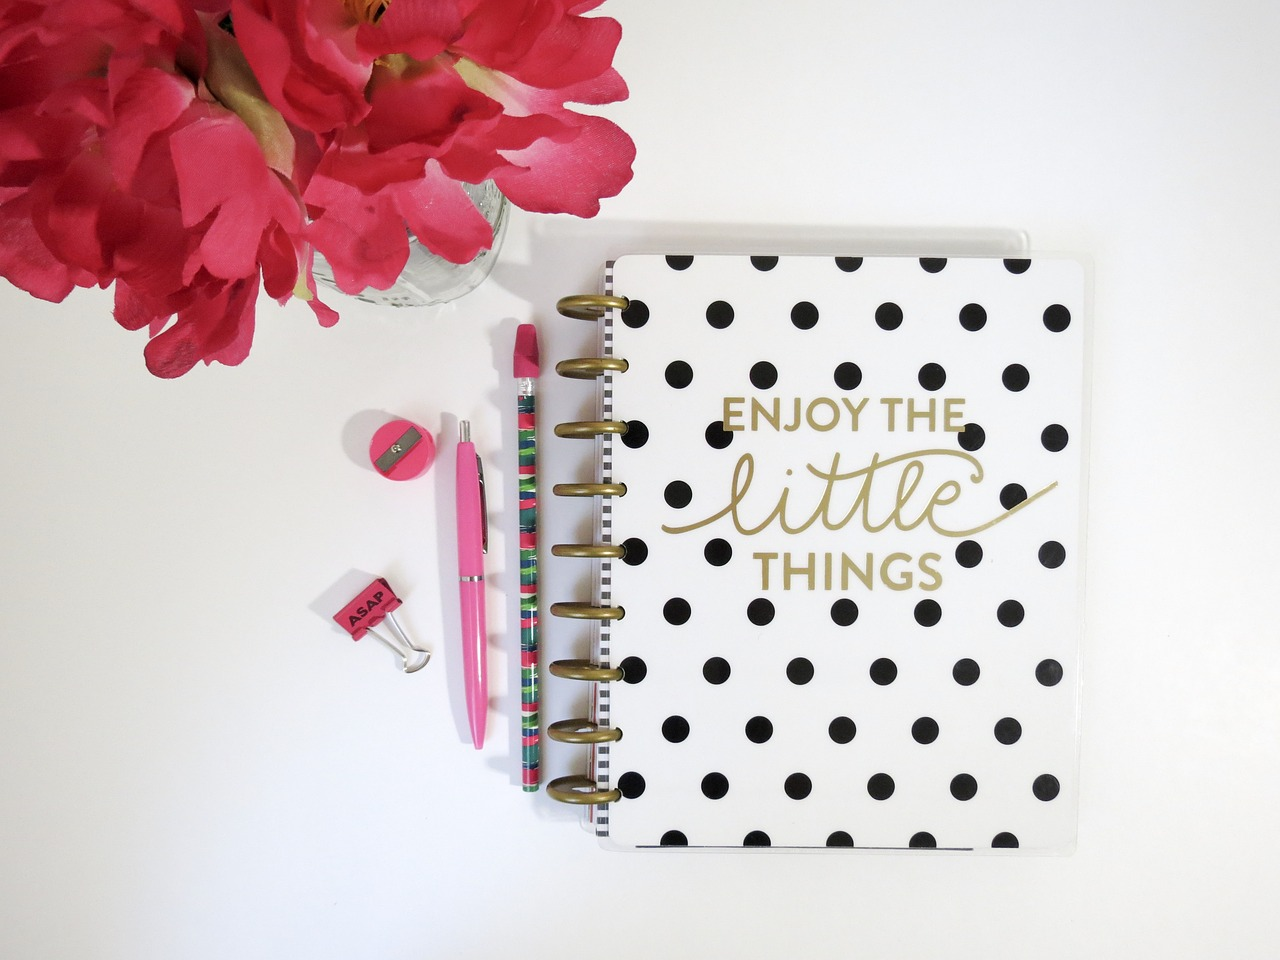 a journal a day keeps problems away